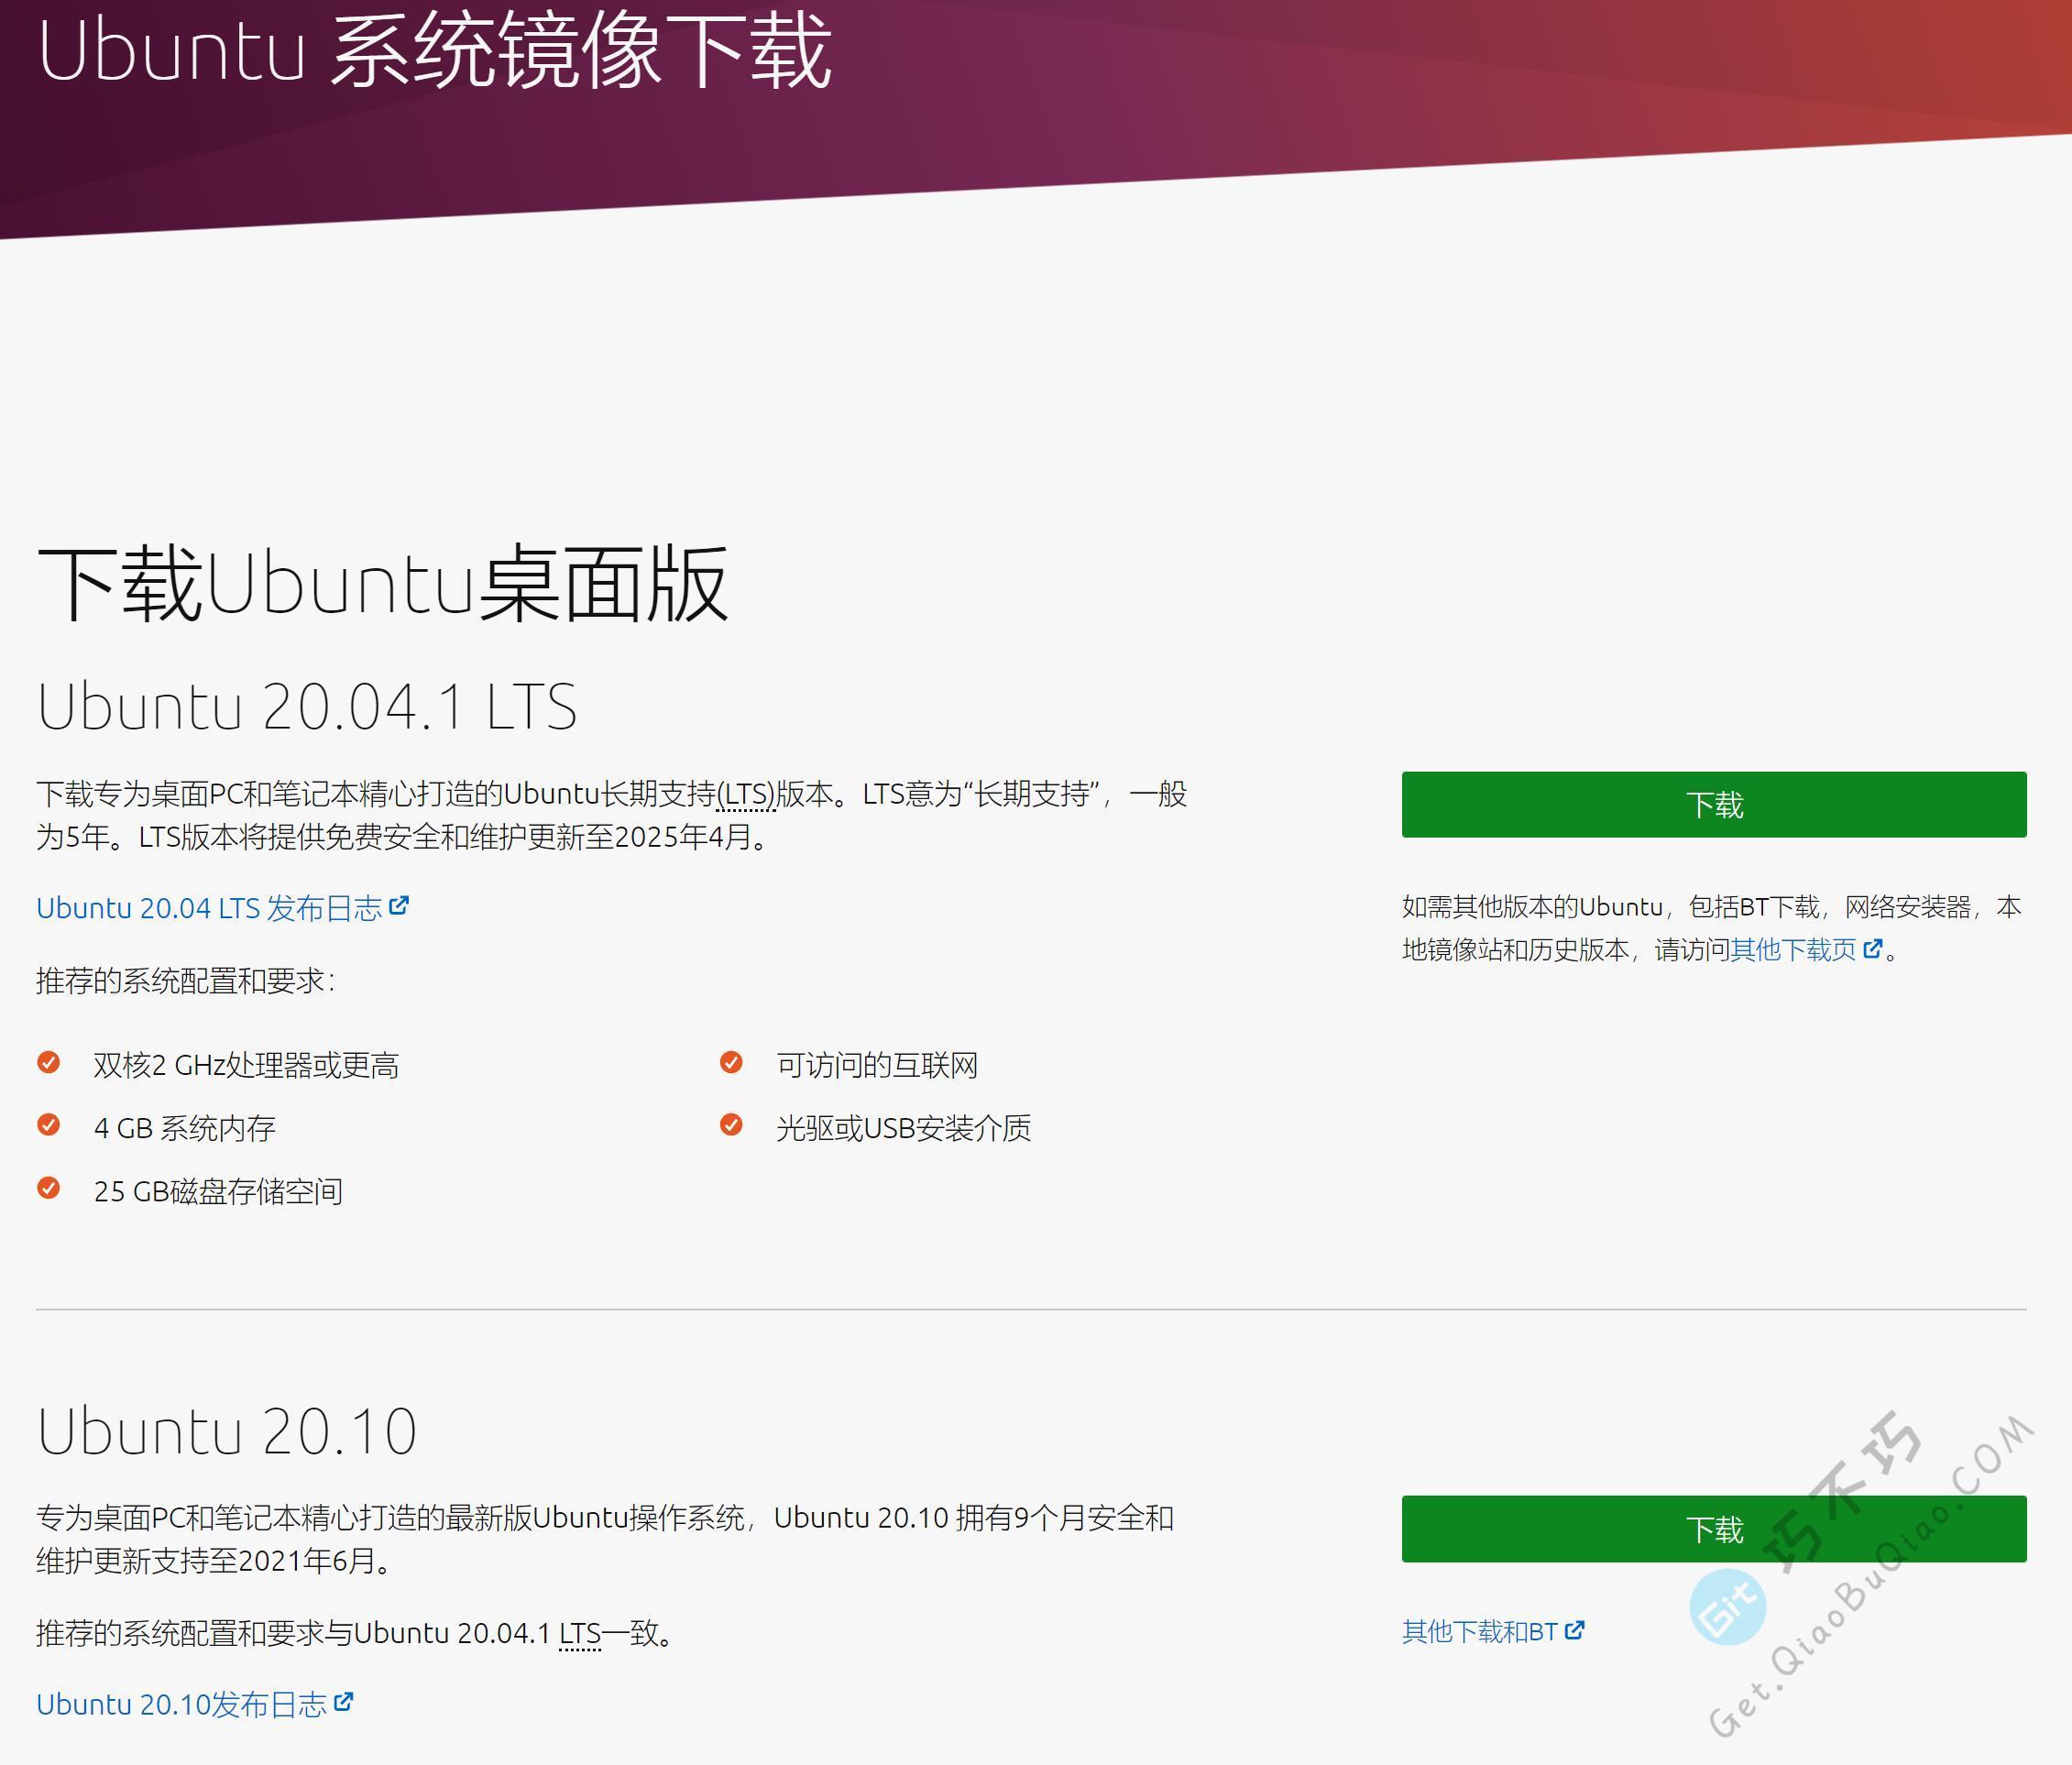 Ubuntu系统最新官方原版ISO镜像64位下载地址和教程